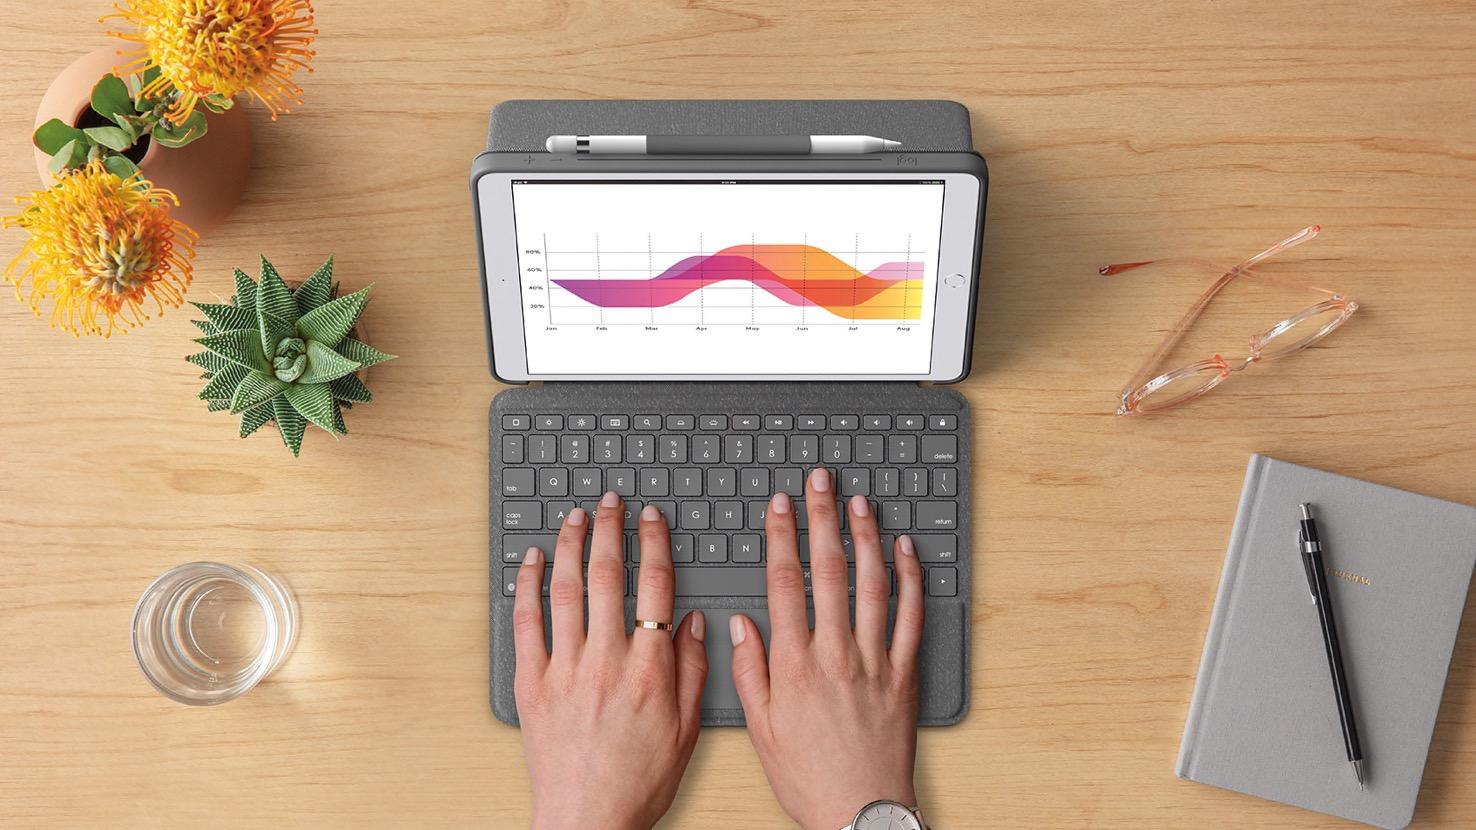 Logitech Combo Touch Case: Abnehmbare Tastatur mit Trackpad für das iPad - Logitech Combo Touch Case (Bild: Logitech)